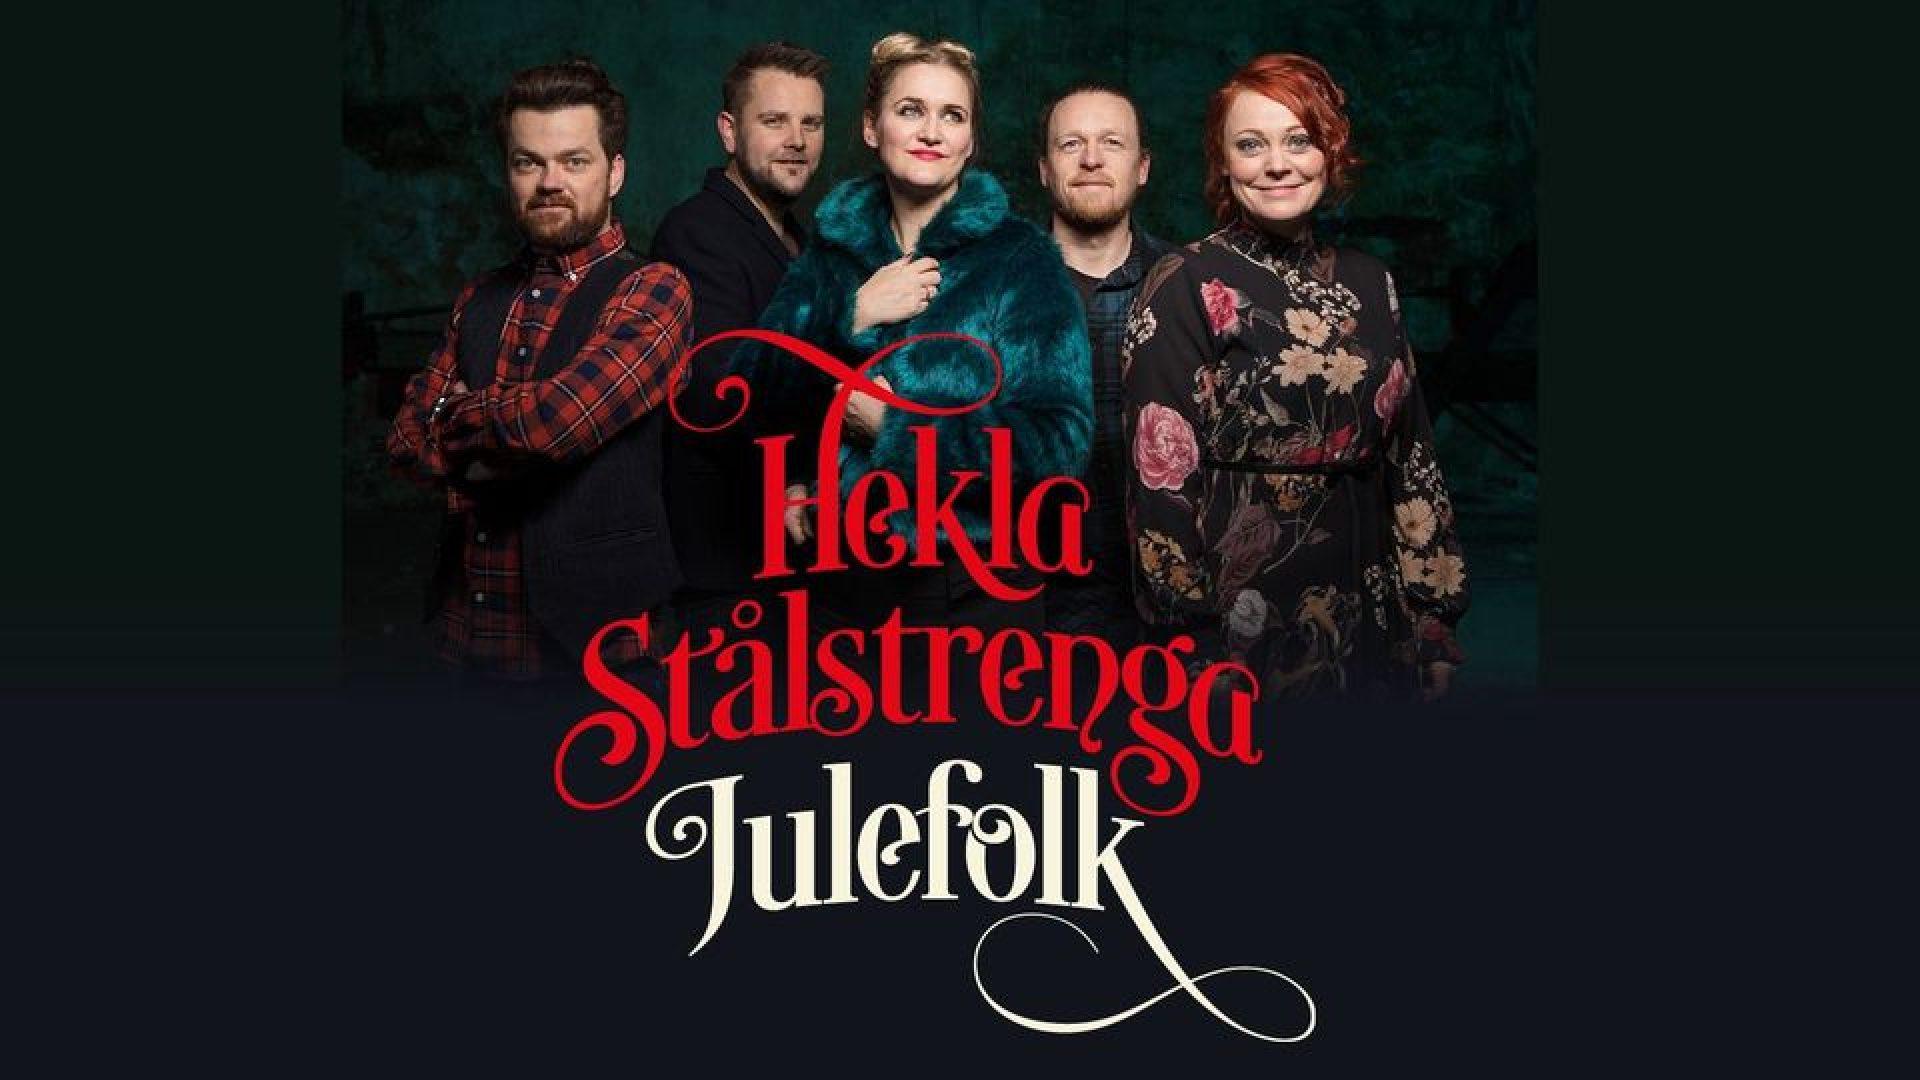 Bandmedlemmene i Hekla Stålstrenga